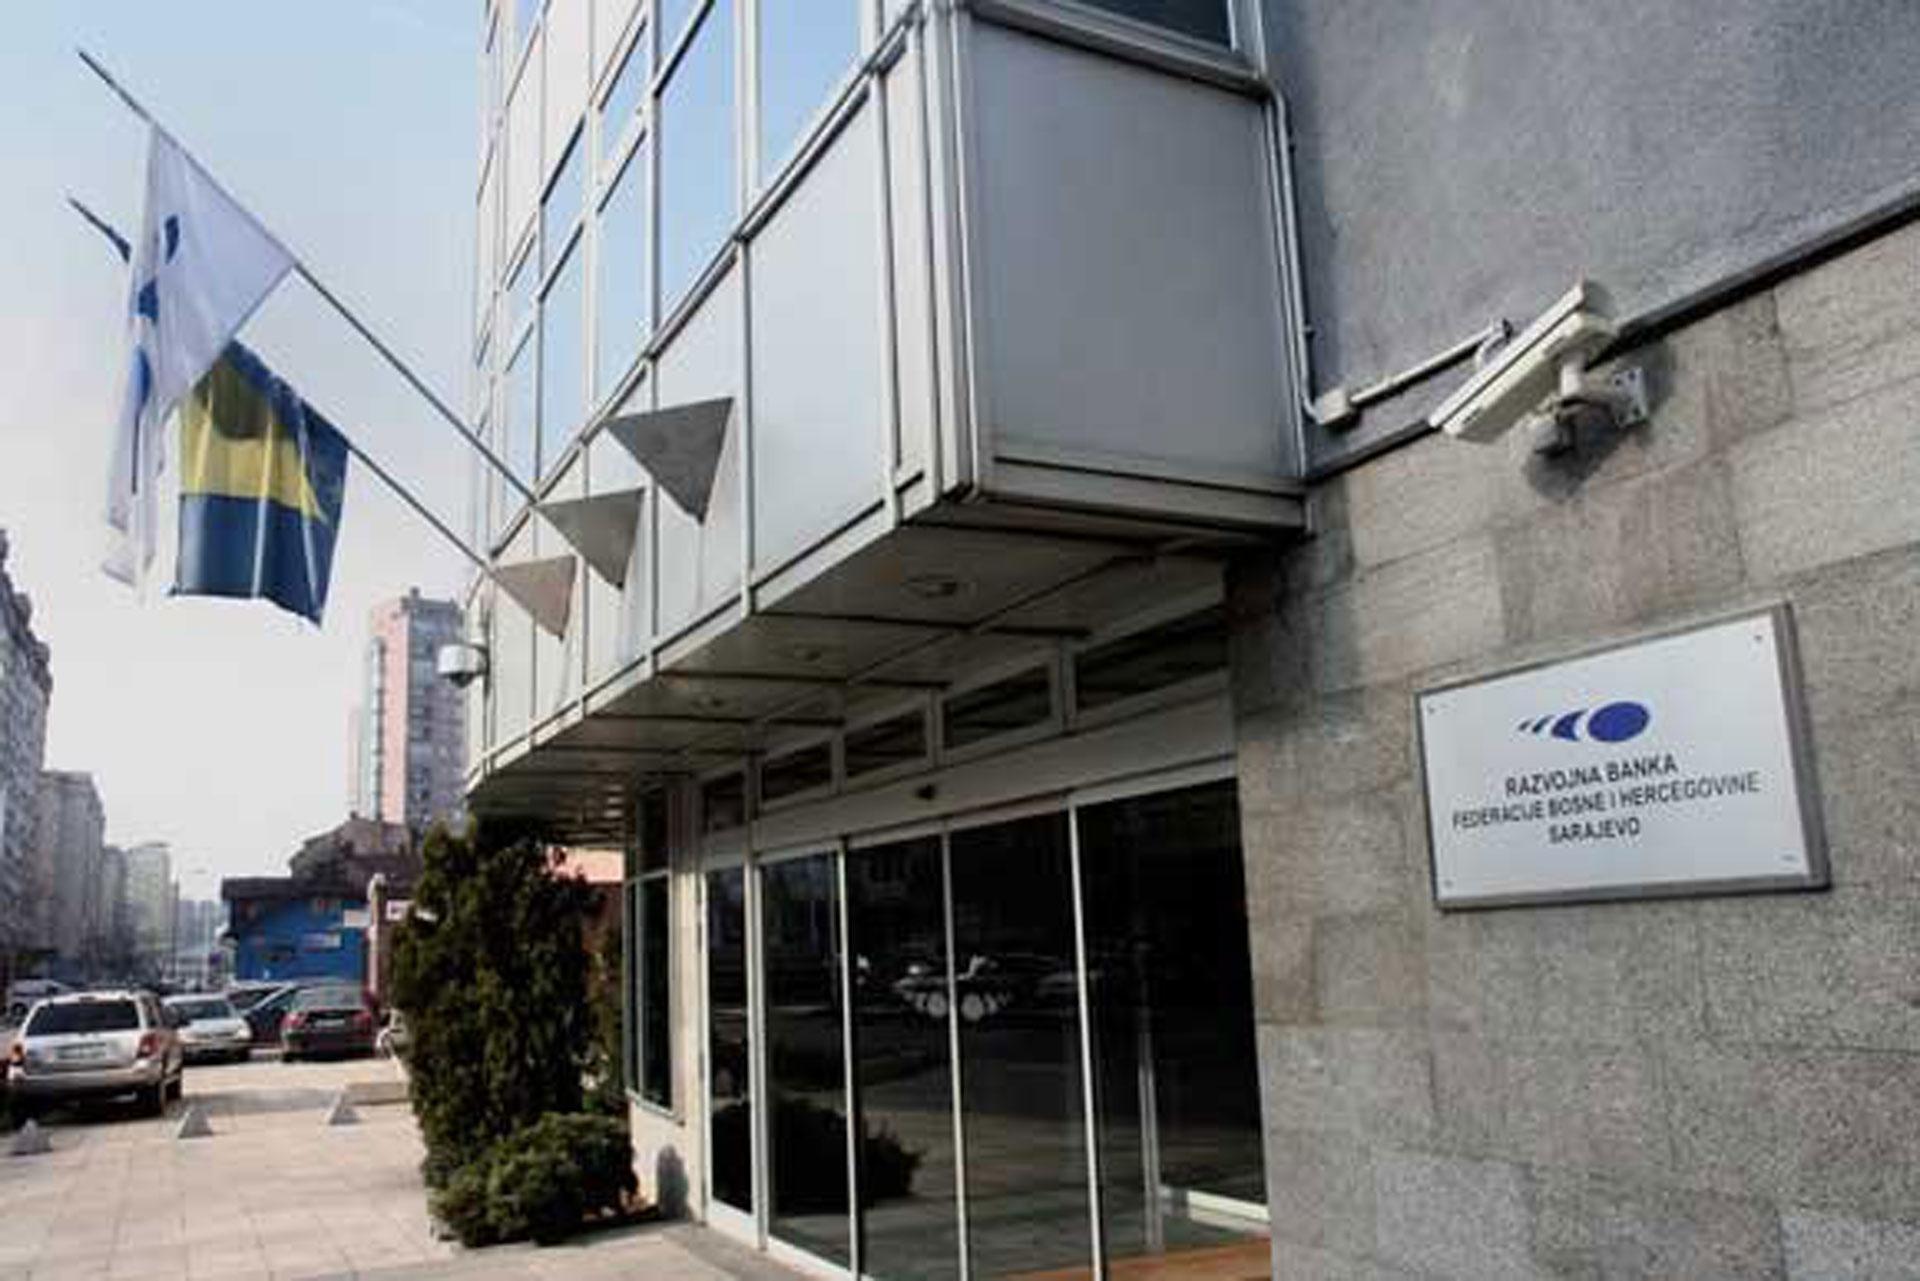 Razvojna Banka